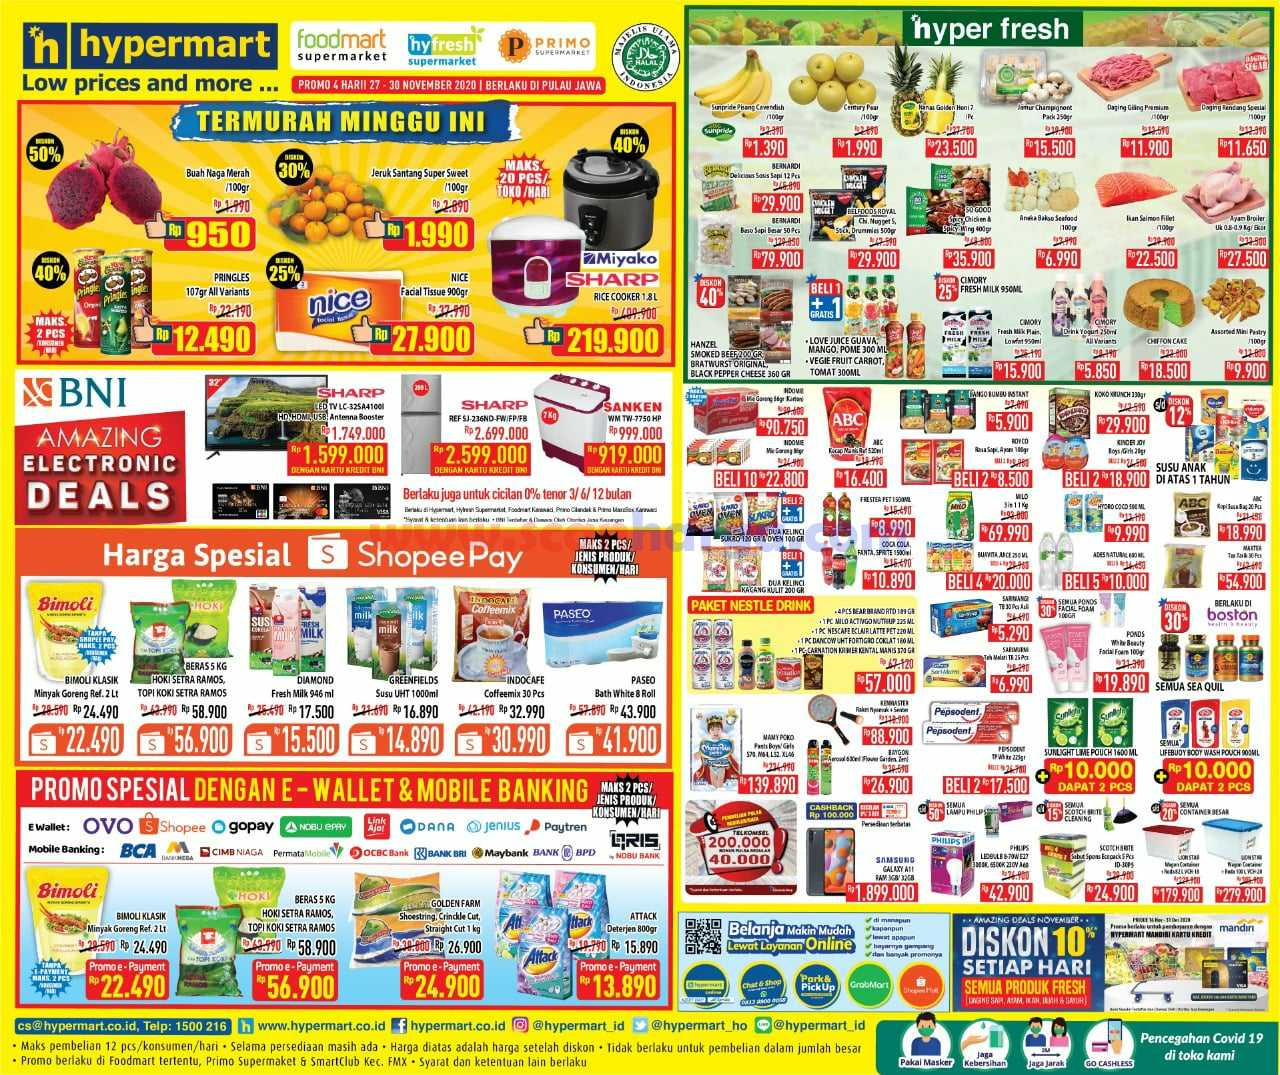 Katalog Promo Hypermart Weekend Terbaru 27 - 30 November 2020